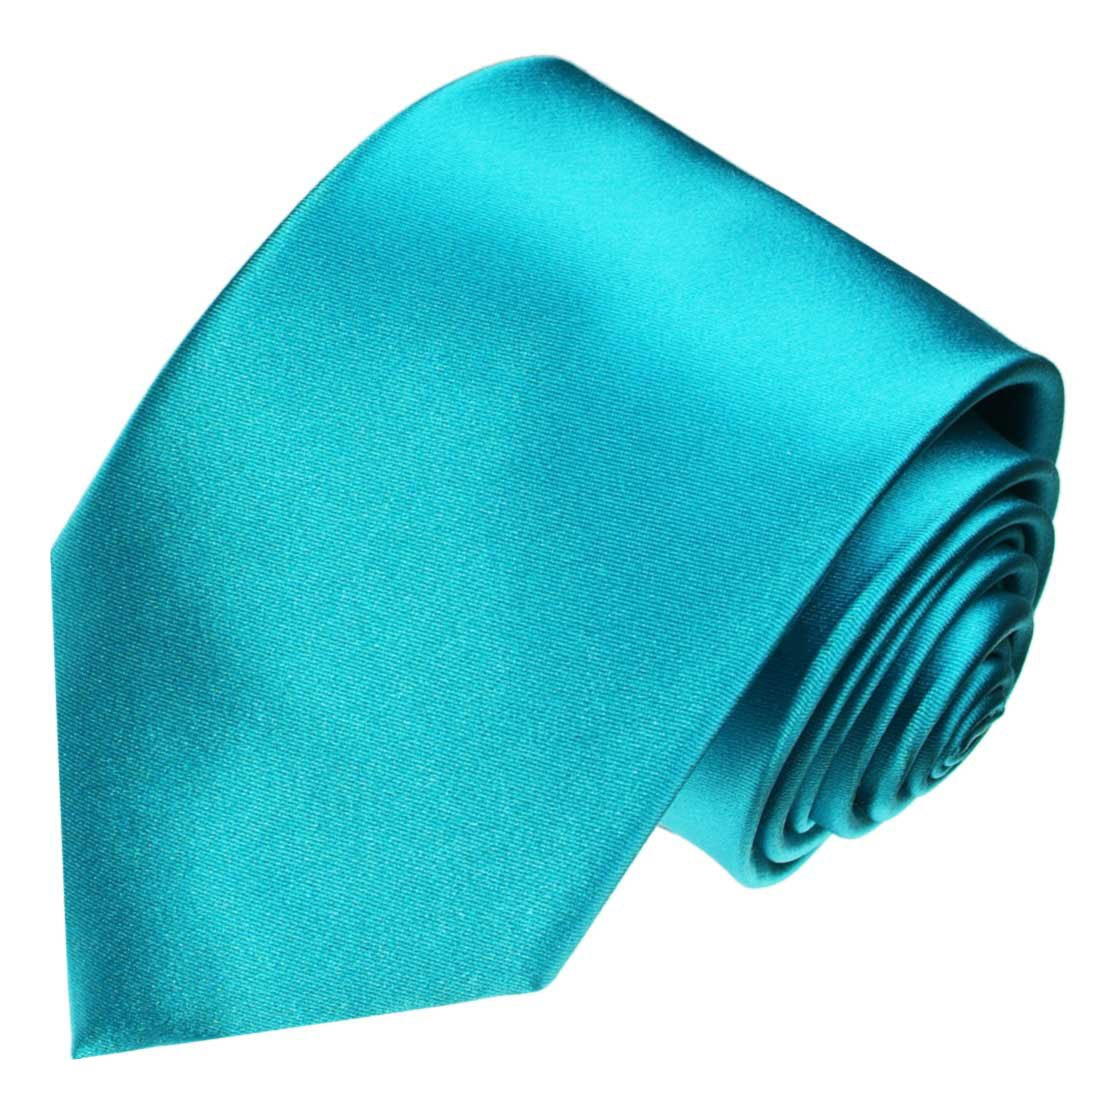 Corbata turquesa